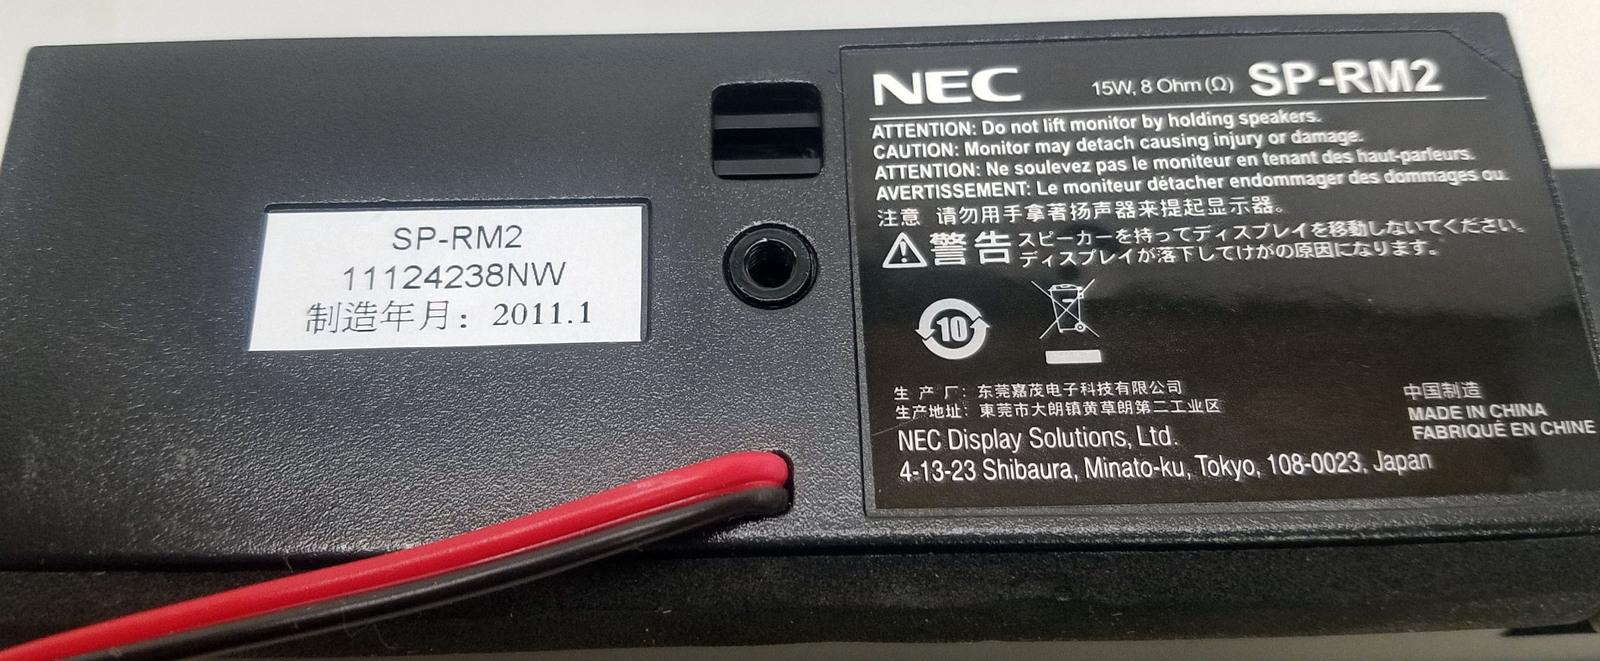 NECSP-RM2 Rear Display Speakers X401s X401s PG X401s AVT X401S-PC (N